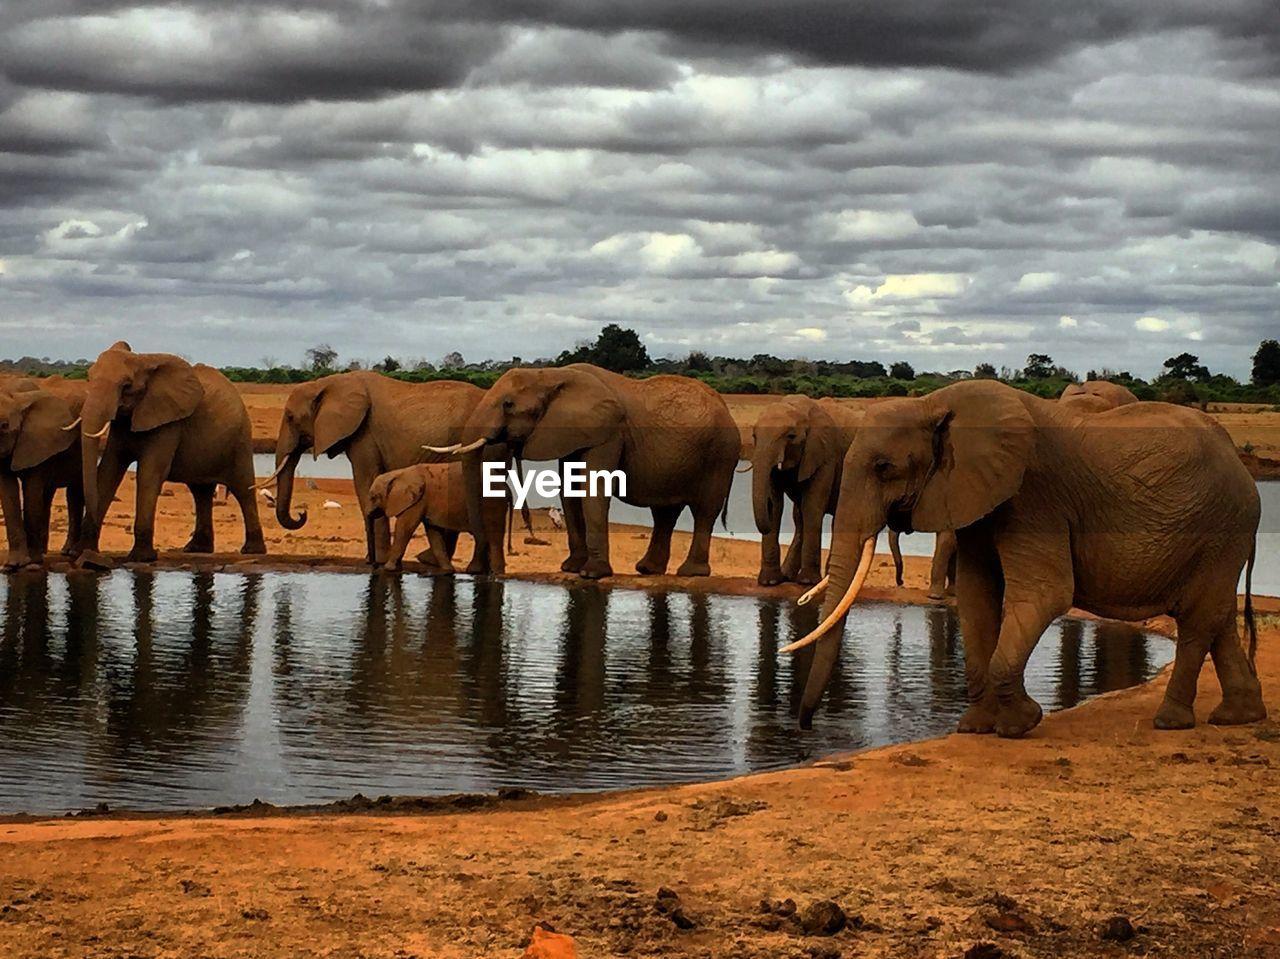 elephant, cloud - sky, sky, animal themes, water, animal, group of animals, animals in the wild, animal wildlife, mammal, nature, safari, day, vertebrate, no people, animal family, lake, outdoors, african elephant, herbivorous, herd, drinking, animal trunk